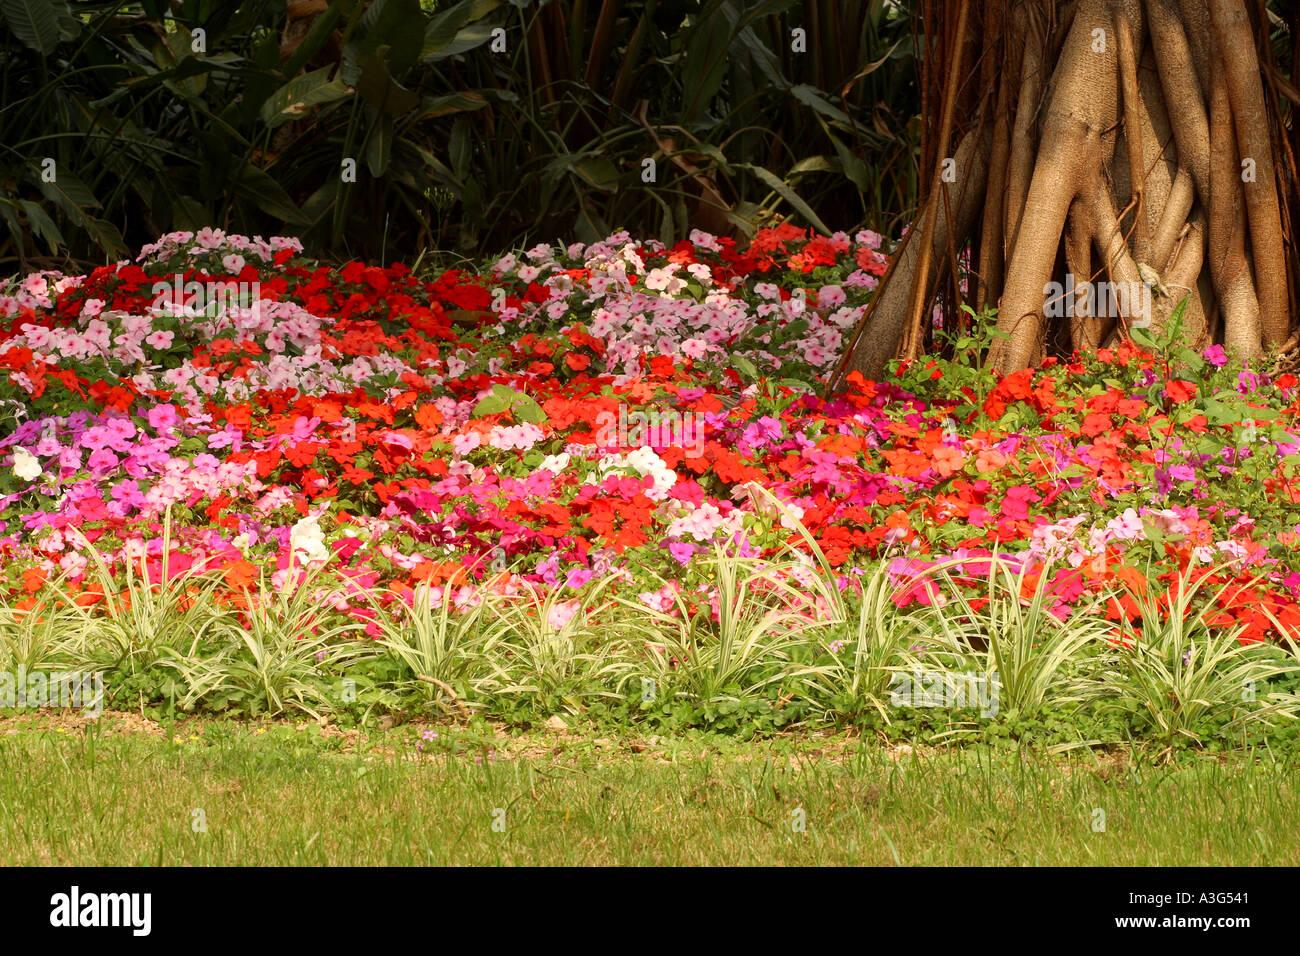 Flowers Shrubs Green Yellow Red Pink Grass Rose Flowering Shrubs